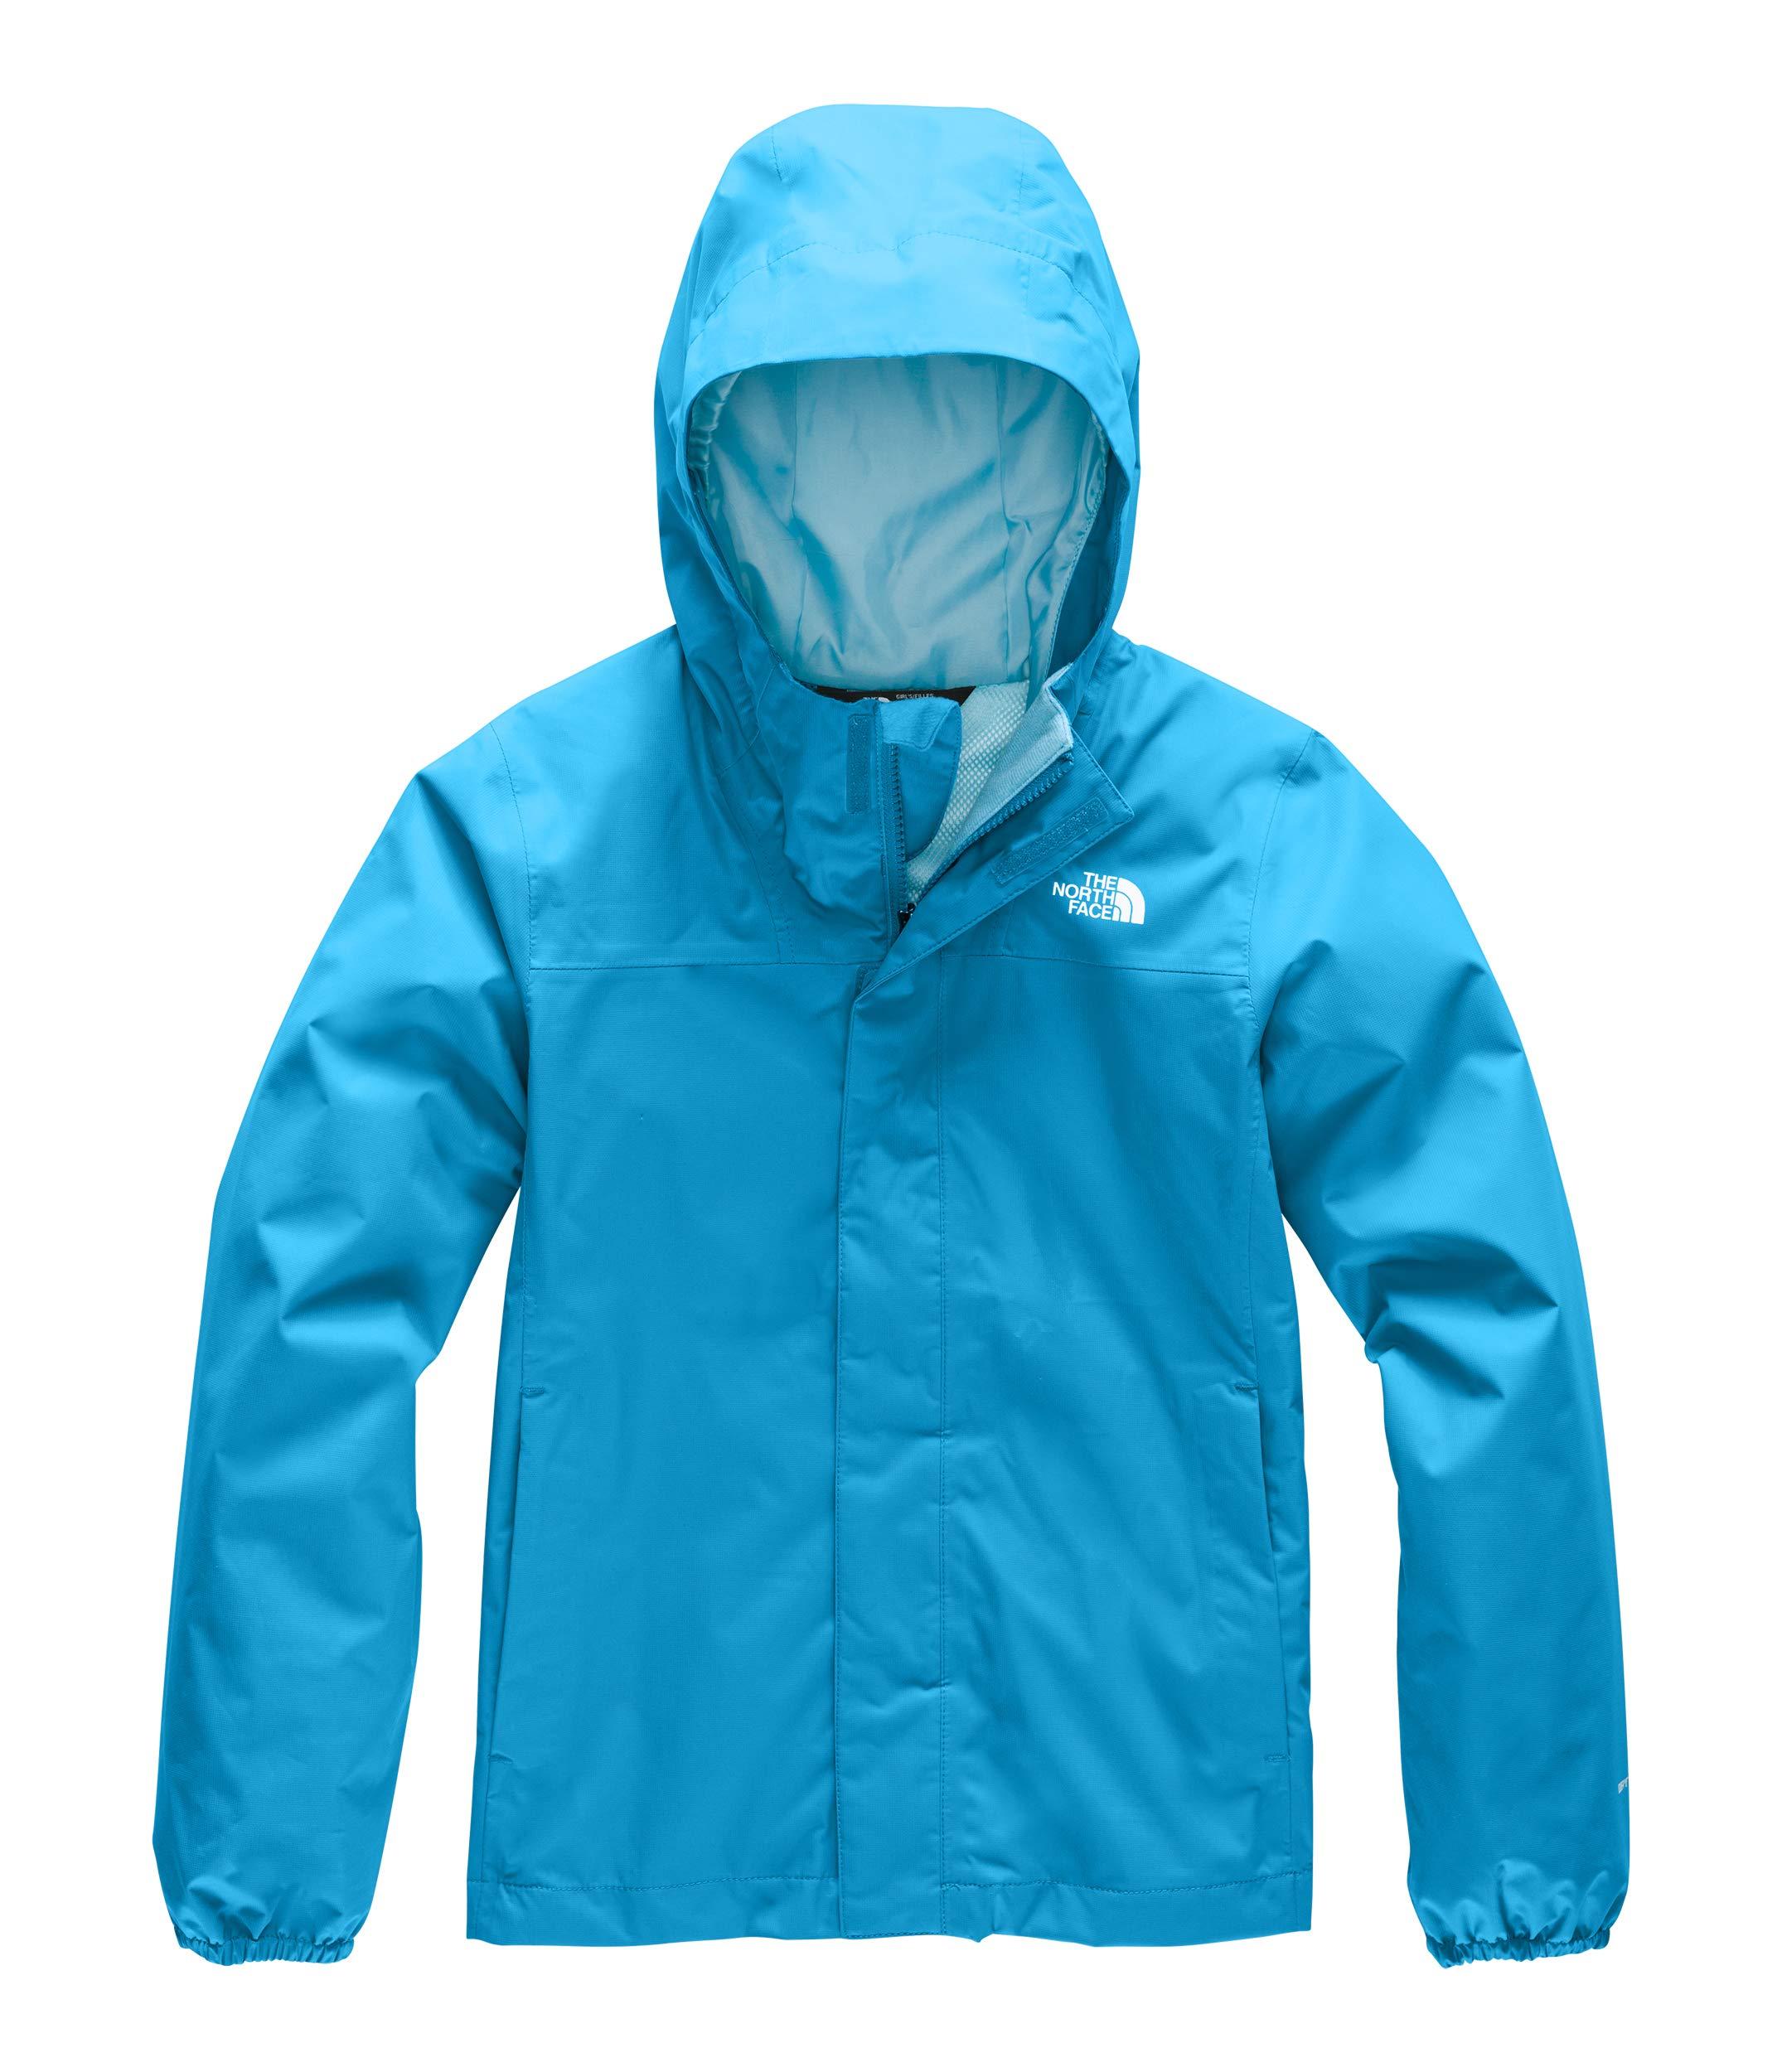 The North Face Kids Girl's Resolve Reflective Jacket (Little Kids/Big Kids) Acoustic Blue Large